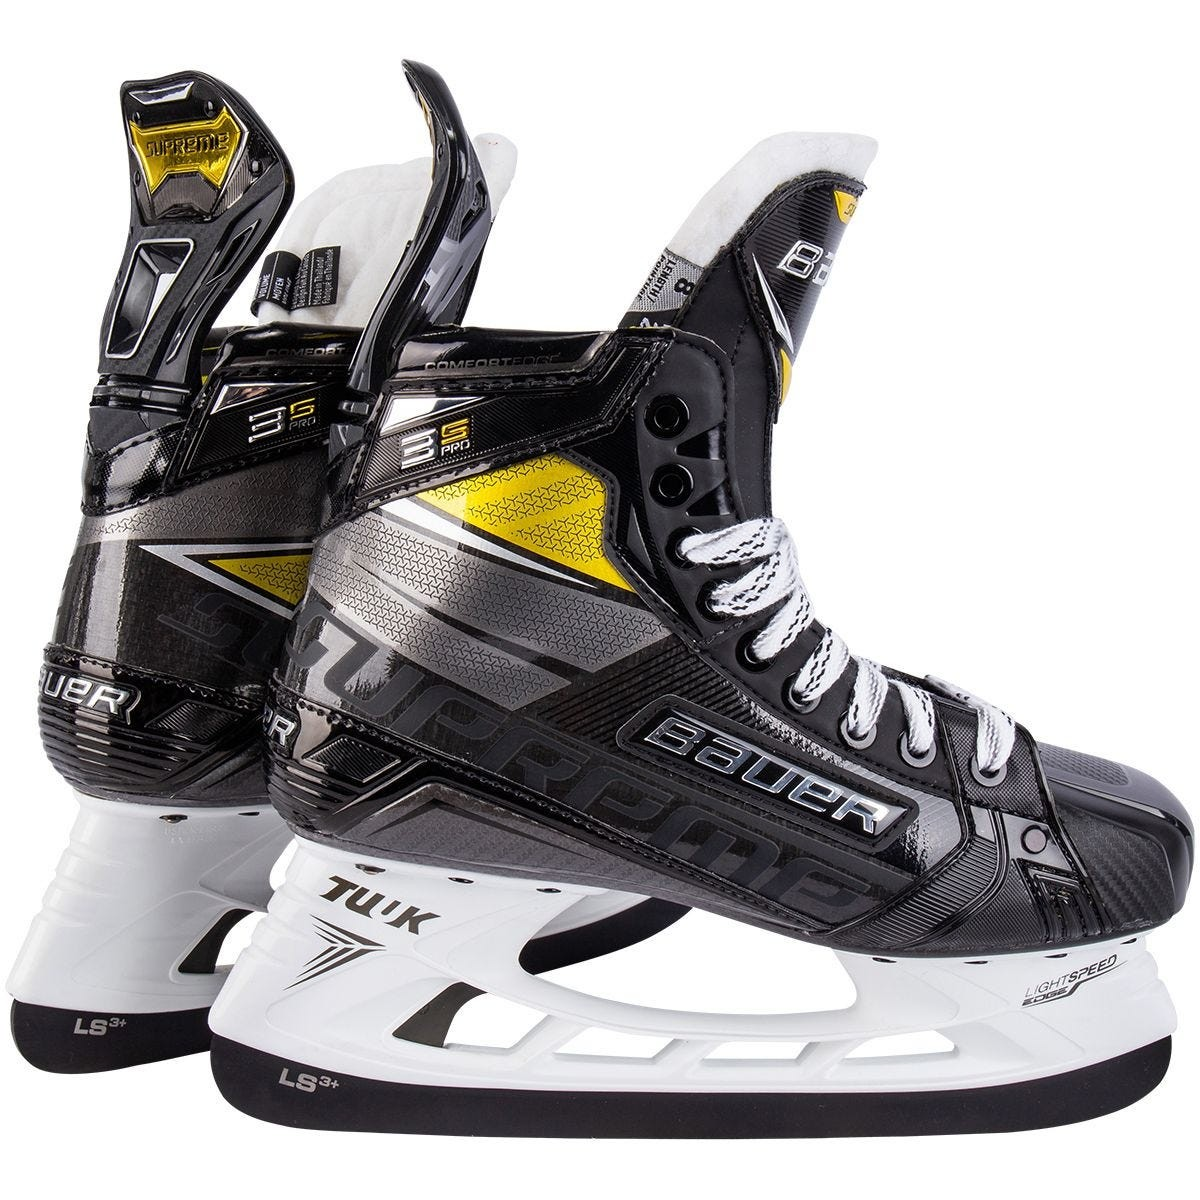 BAUER Supreme 3S Pro S20 Junior Ice Hockey Skates